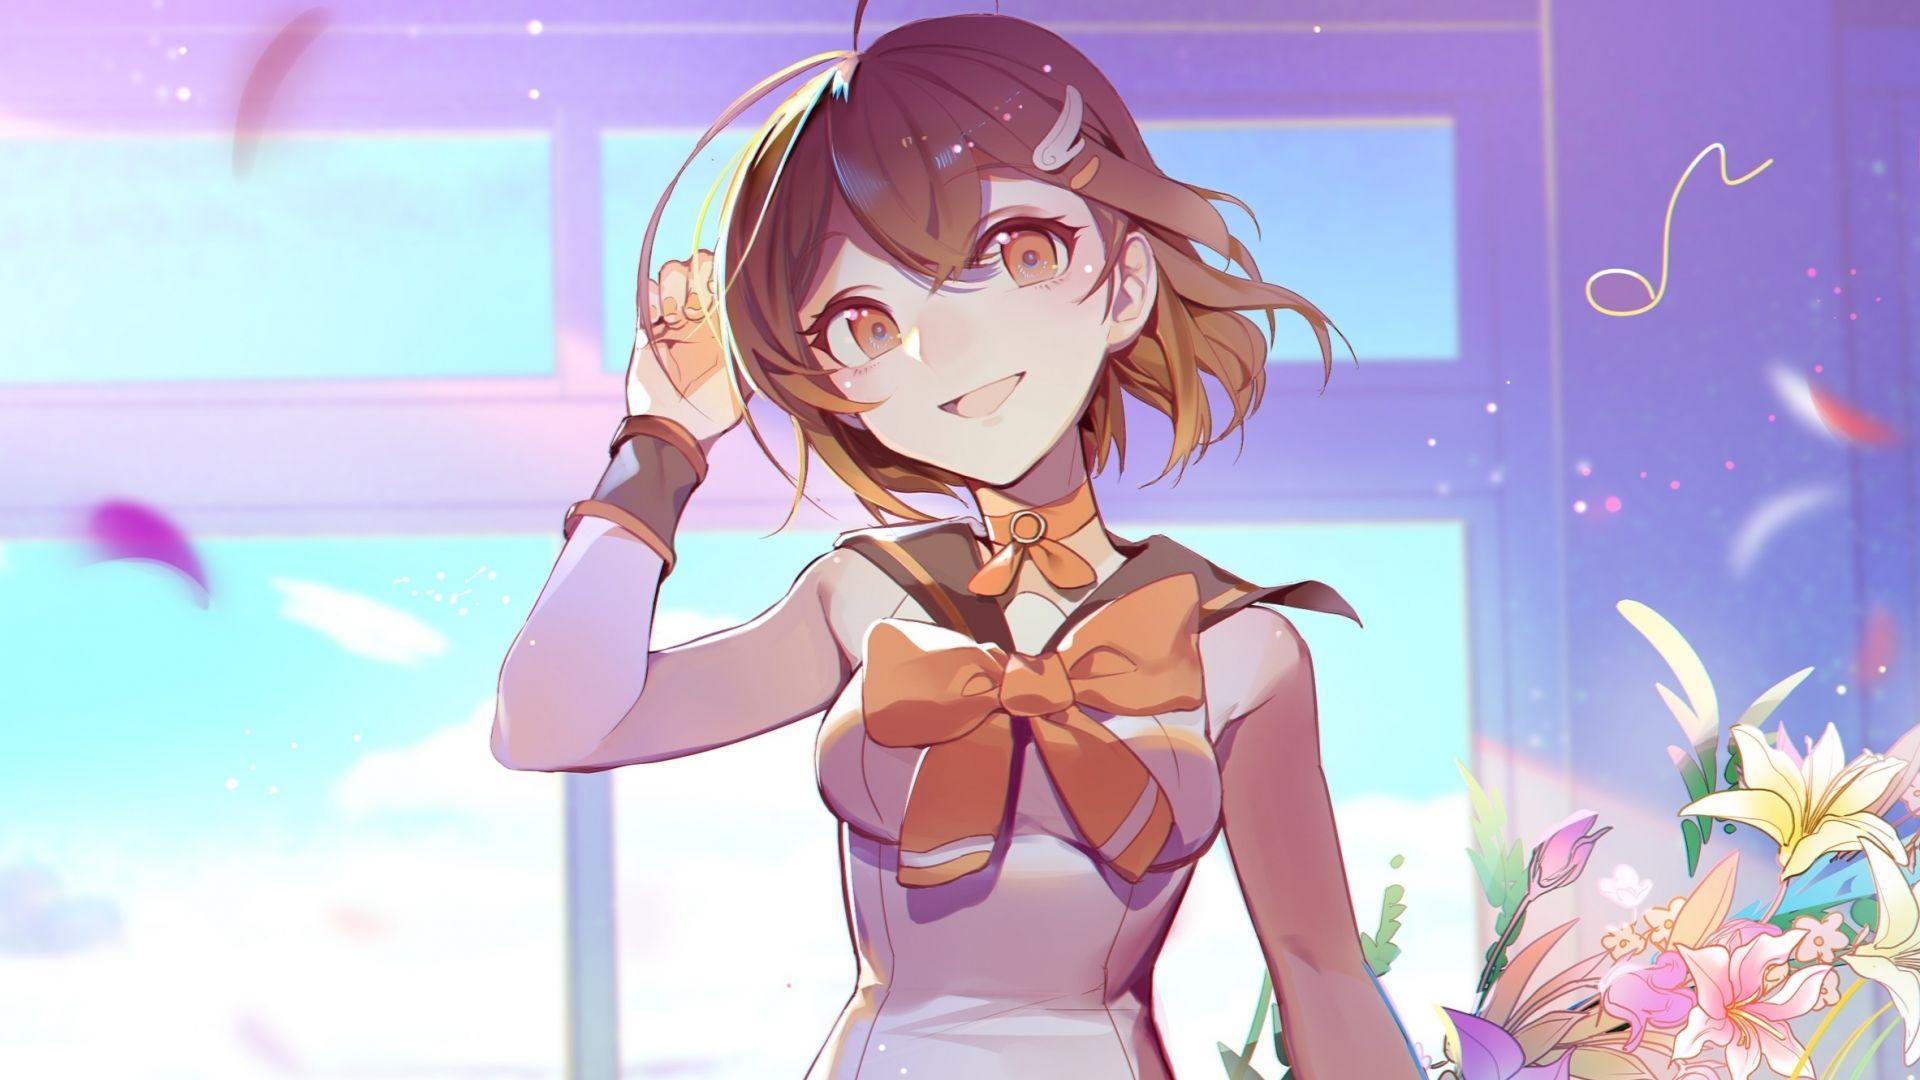 Desktop wallpaper mood happy anime girl cute original hd 1920x1080